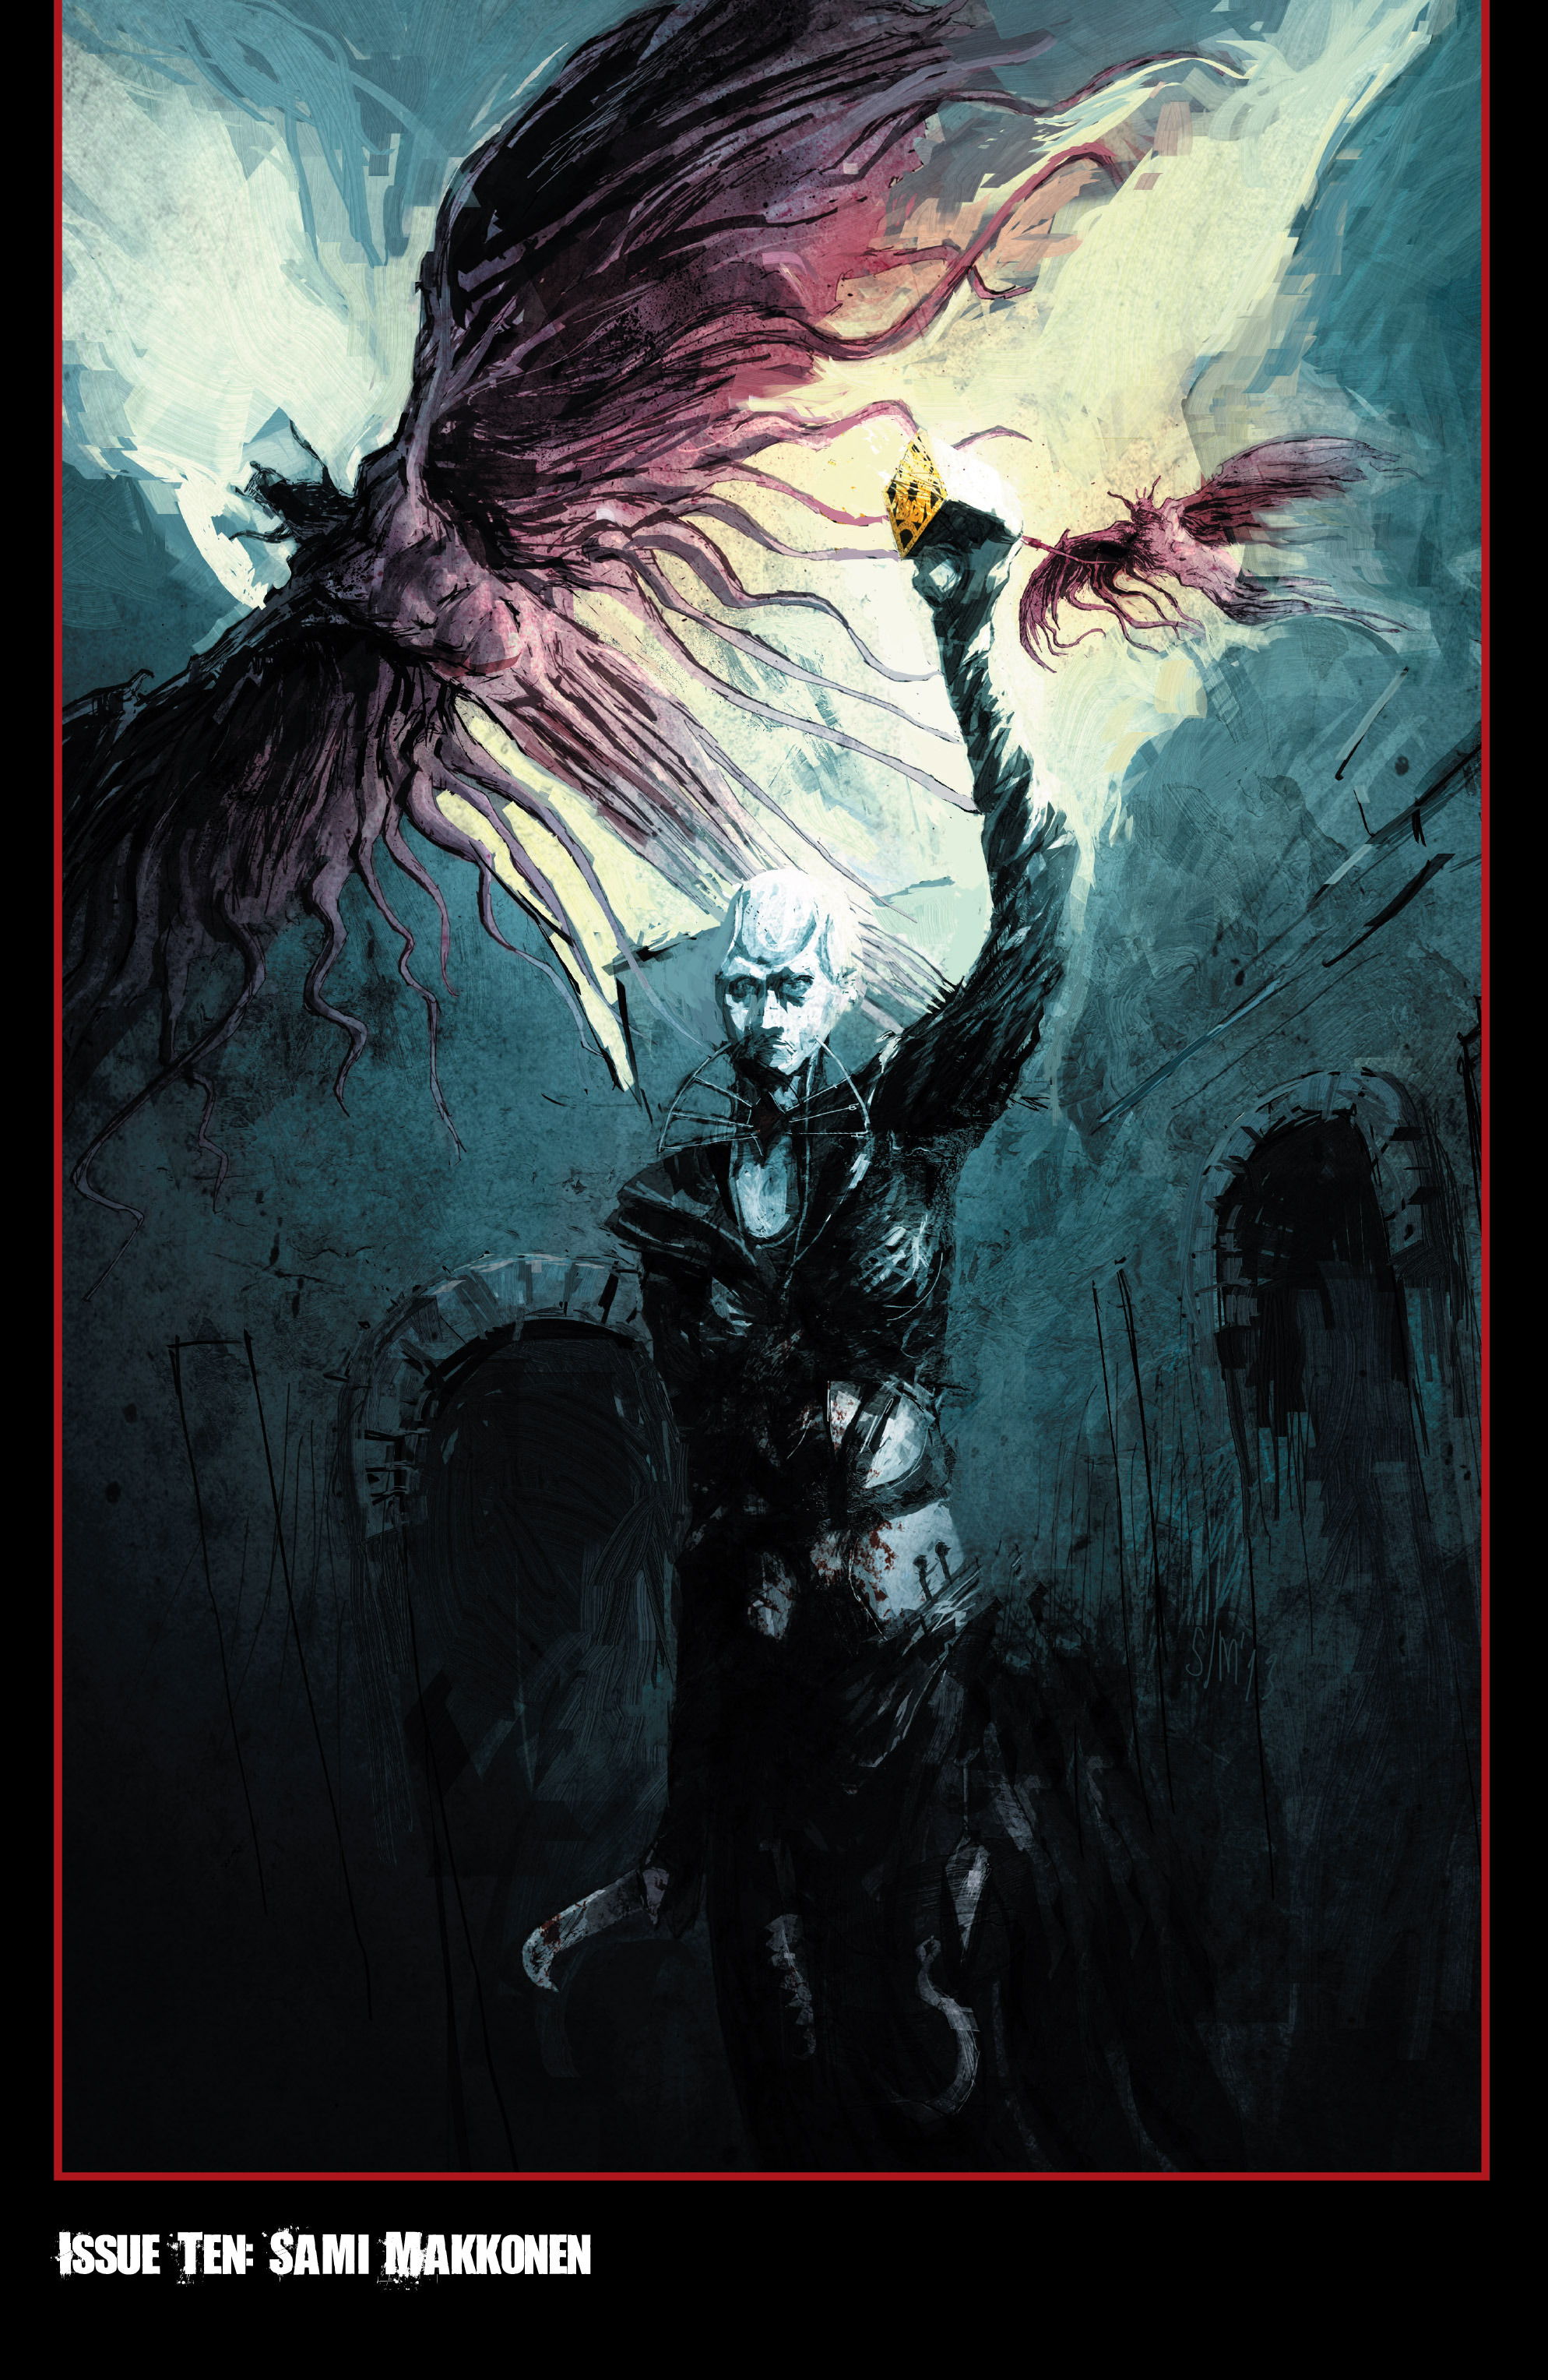 Read online Clive Barker's Hellraiser: The Dark Watch comic -  Issue # TPB 3 - 132